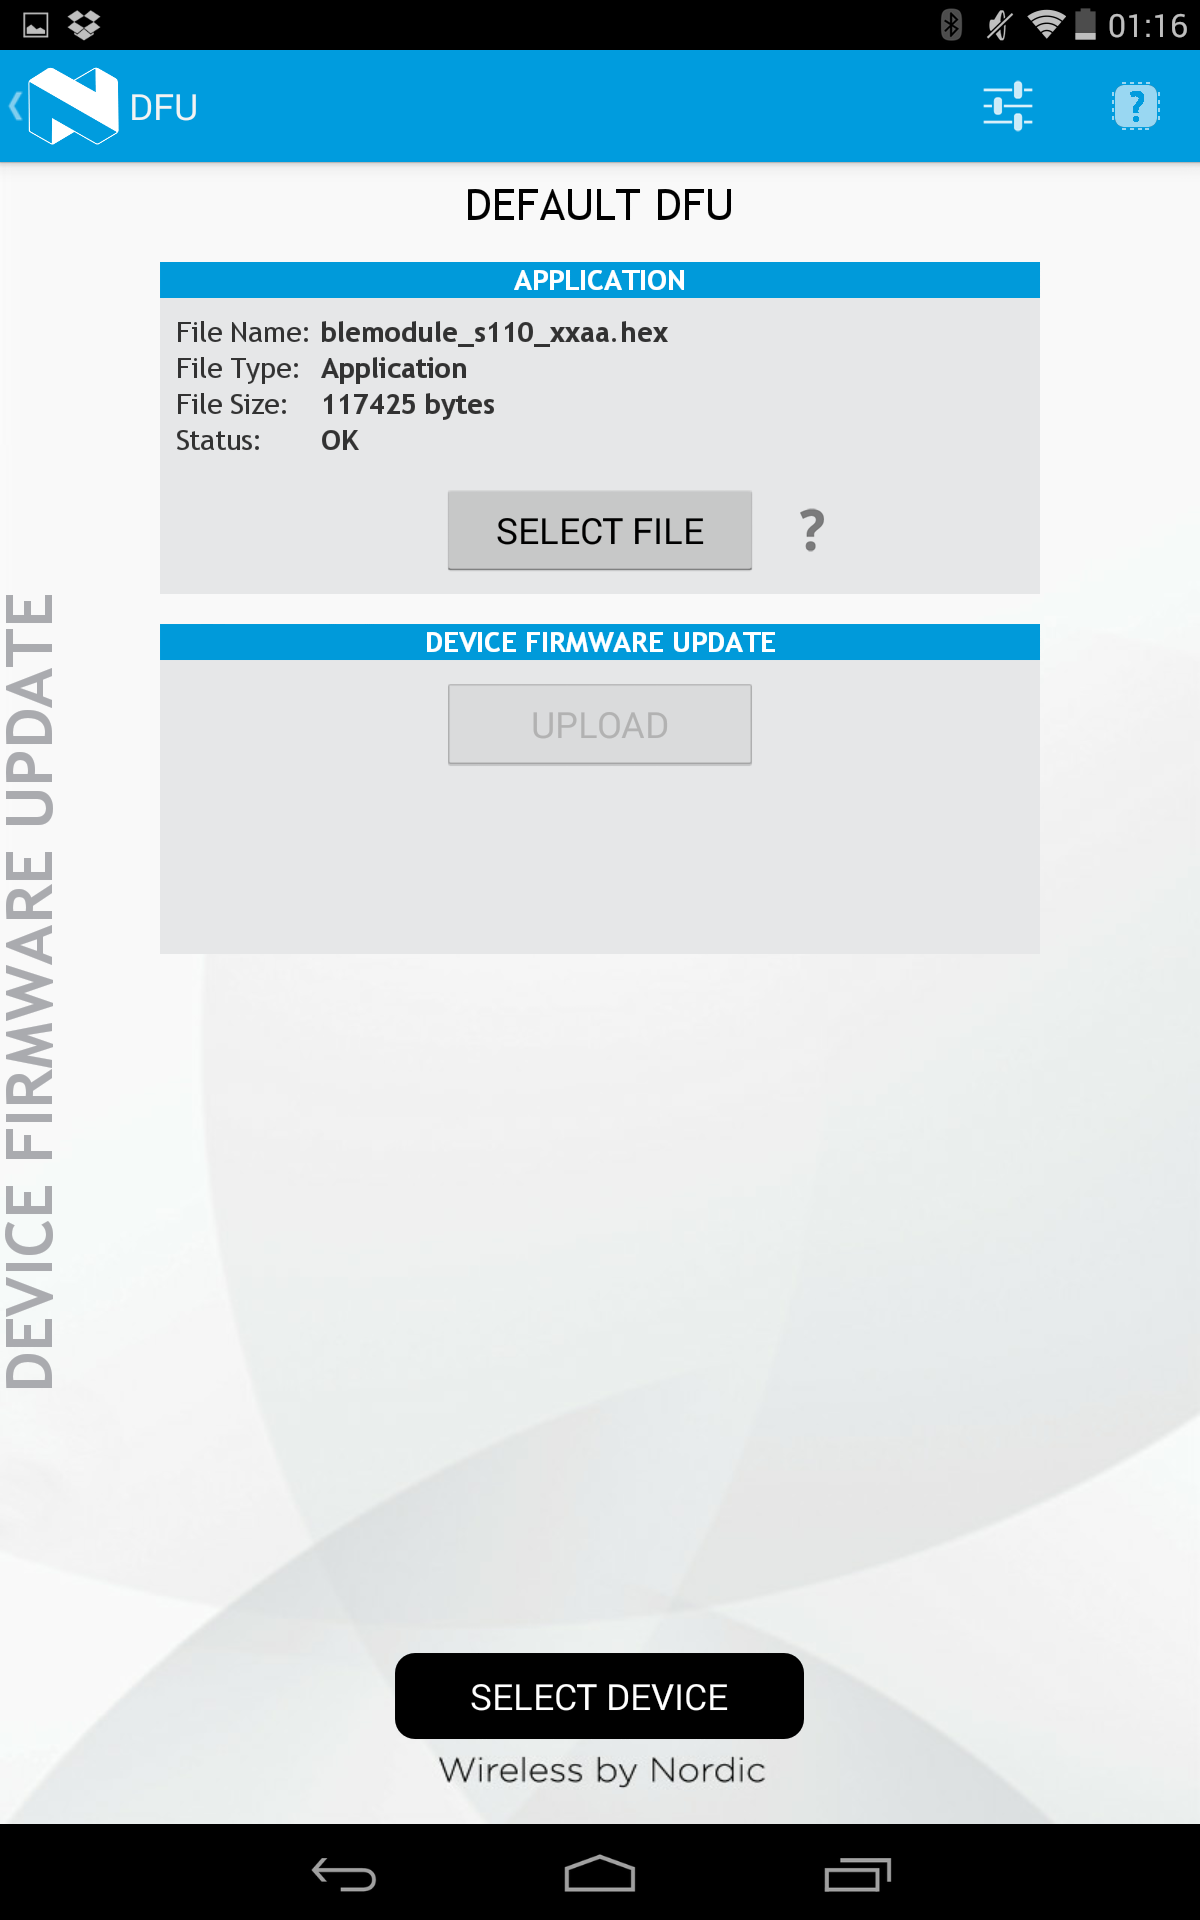 adafruit_products_Screenshot_2014-09-25-01-16-03.png